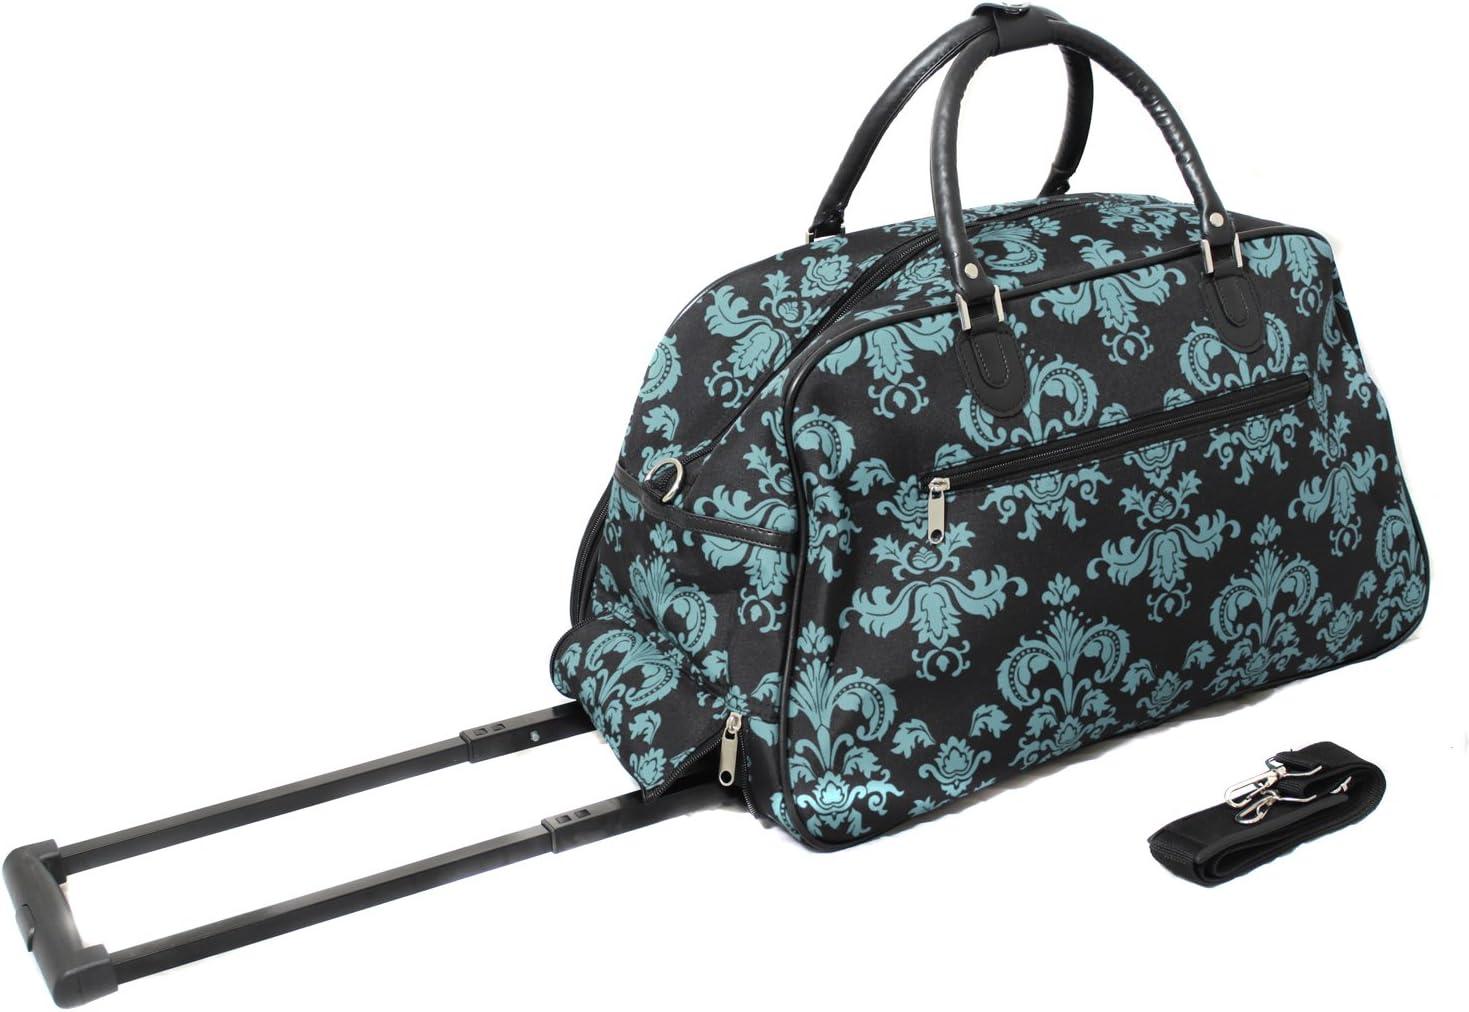 World Traveler 21 Inch Carry On Rolling Duffel Bag Black Blue Damask Travel Duffels